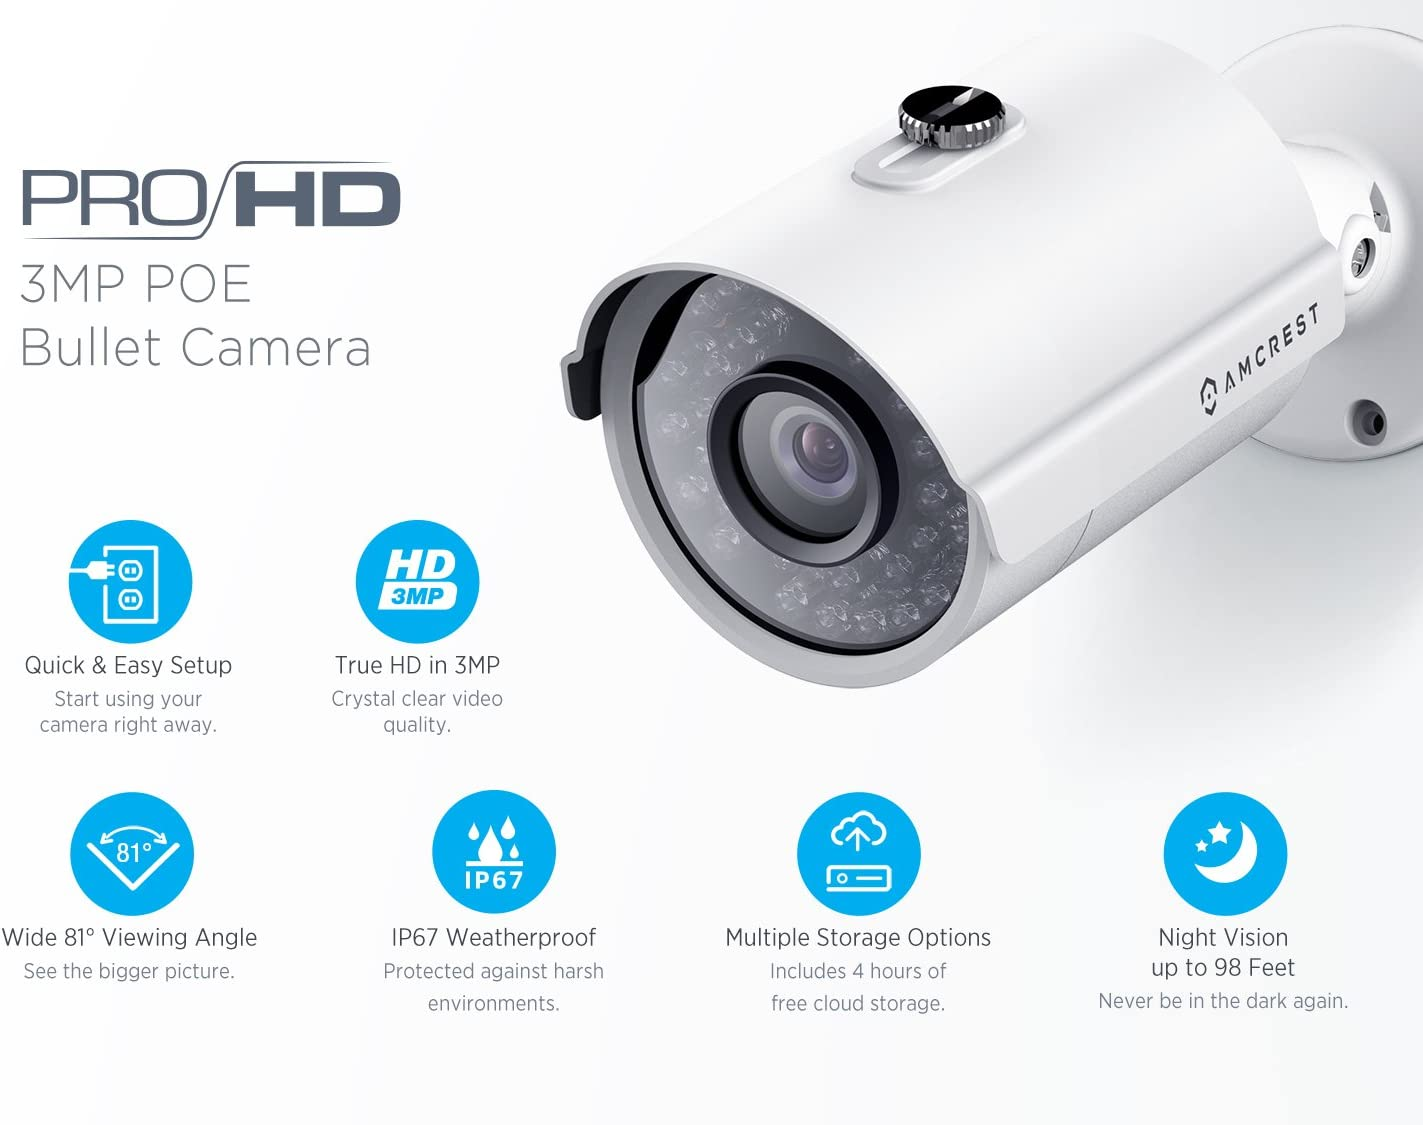 3MP IP3M-954E Amcrest ProHD Outdoor 3 Megapixel POE Bullet IP Security Camera White 2048 TVL Renewed IP67 Weatherproof